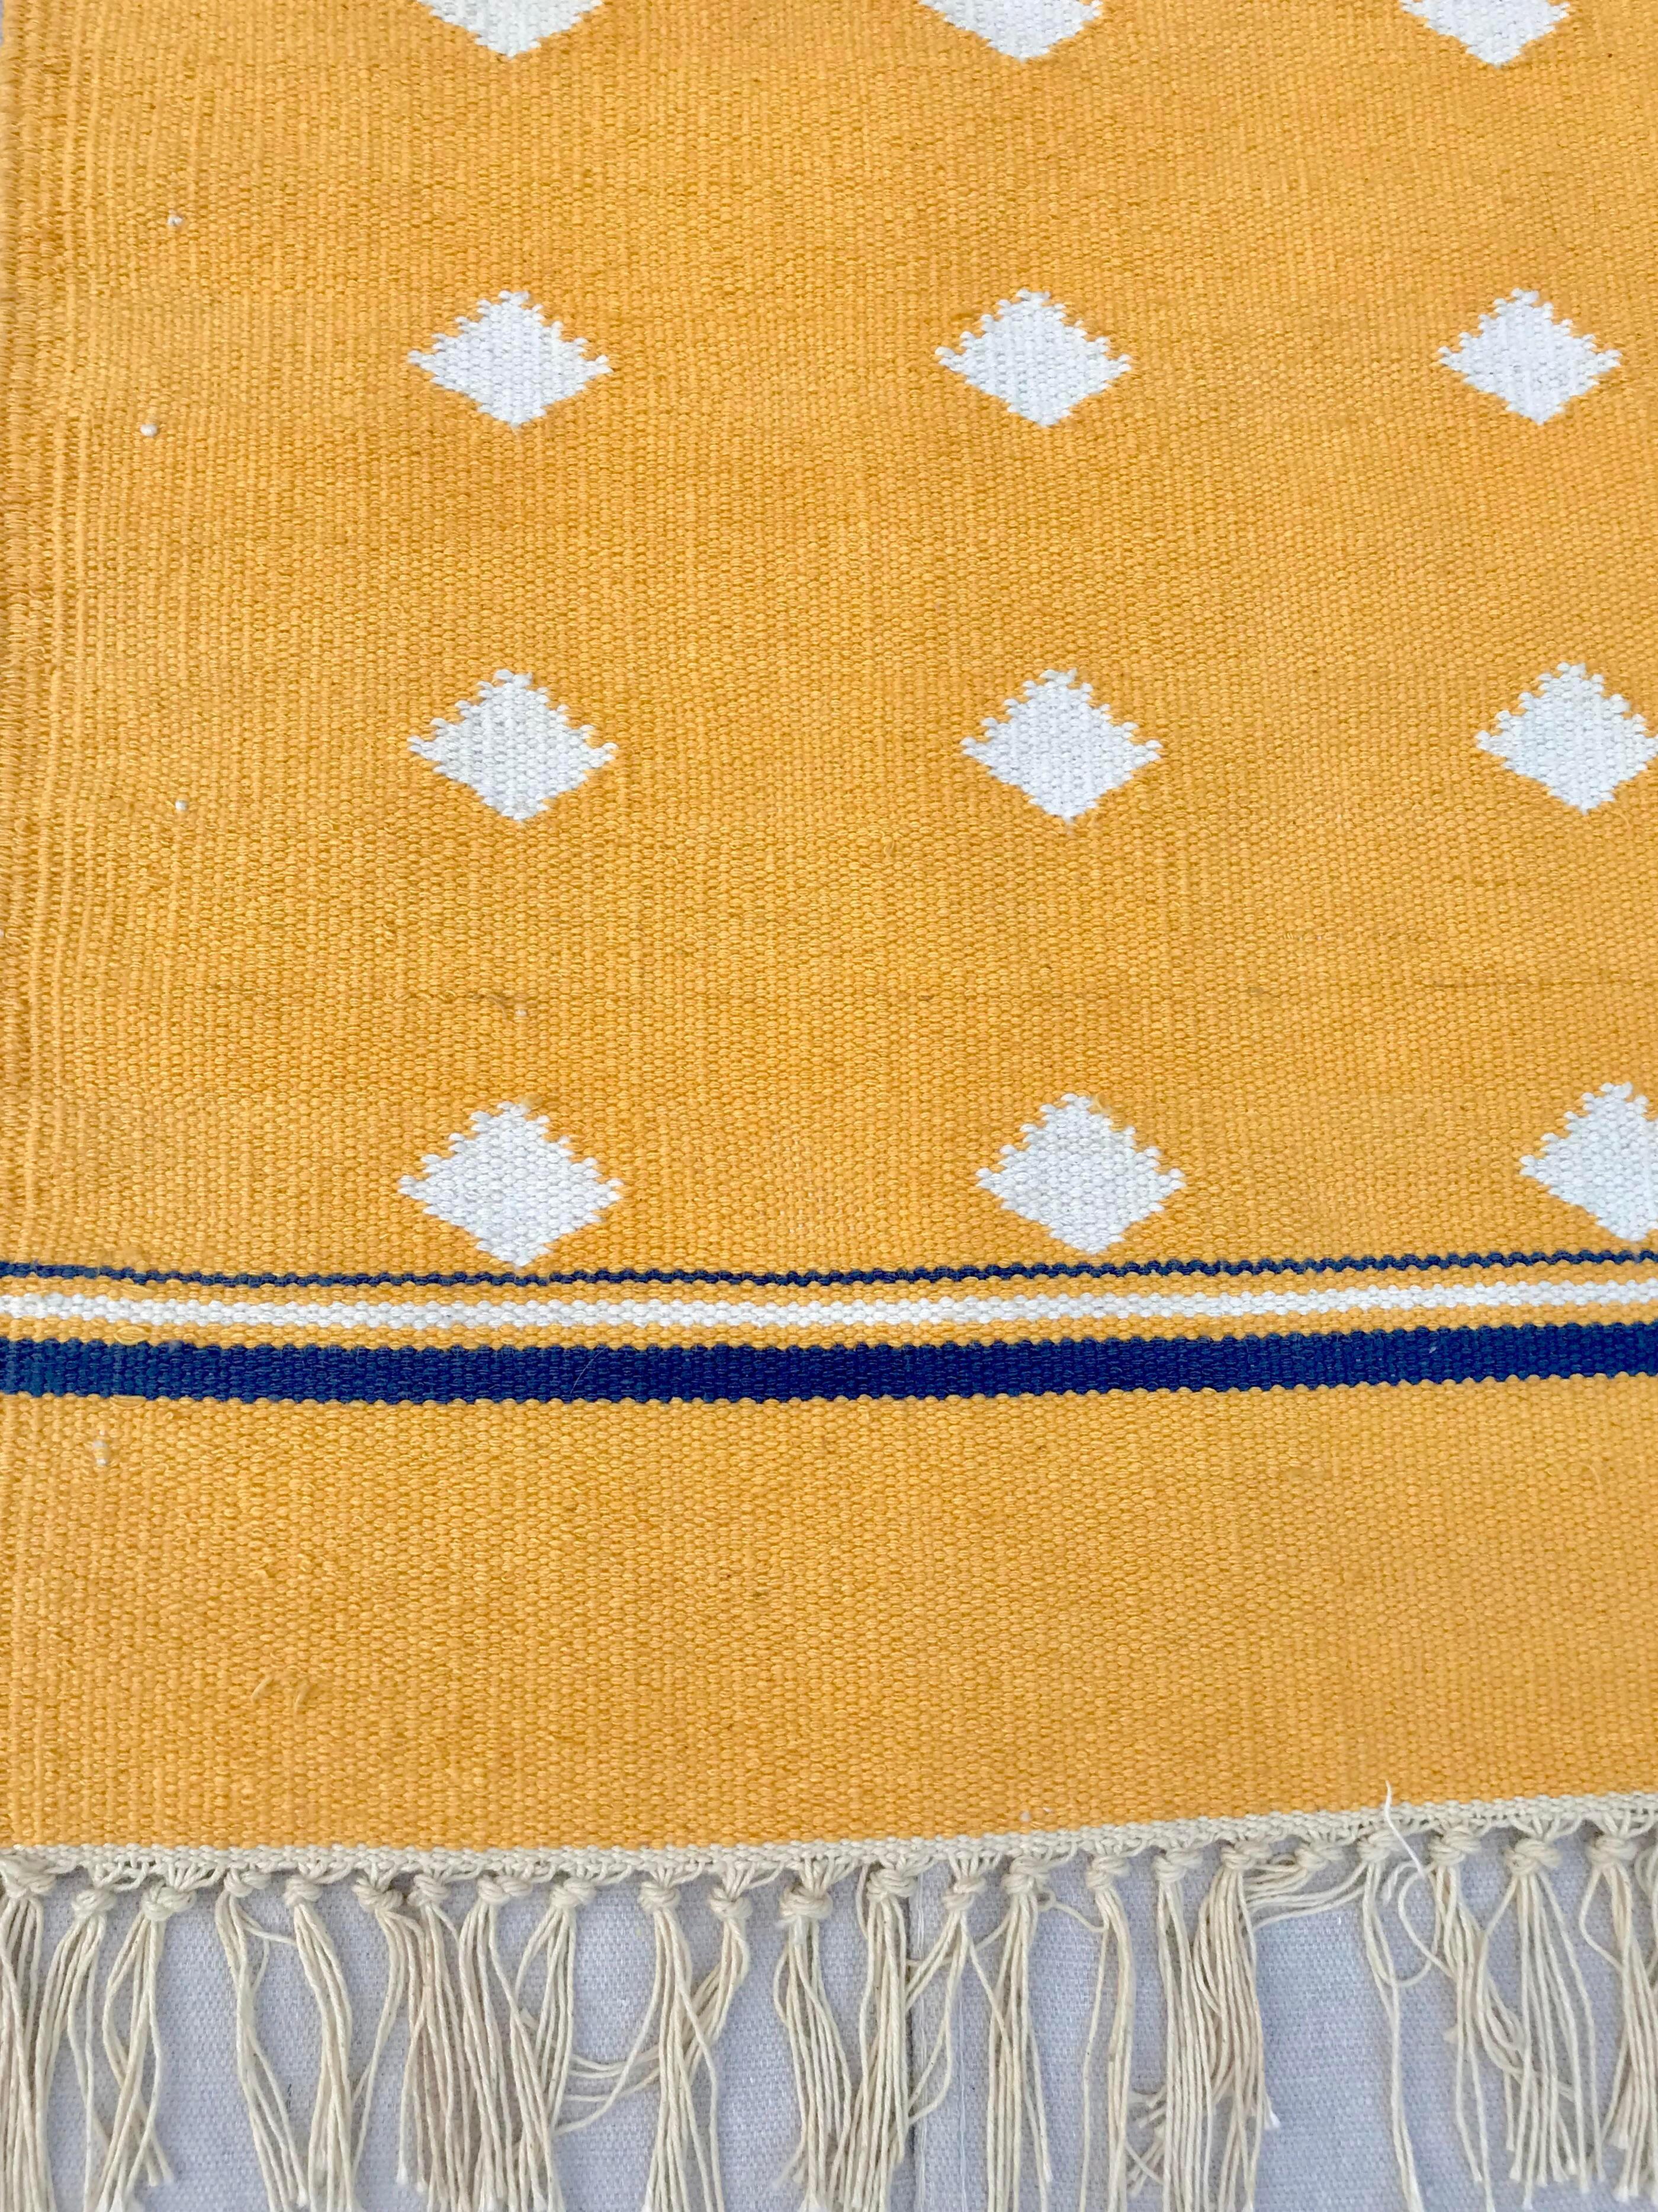 Yellow Flat Weave Cotton Rug 3 7 5 6 Chairish